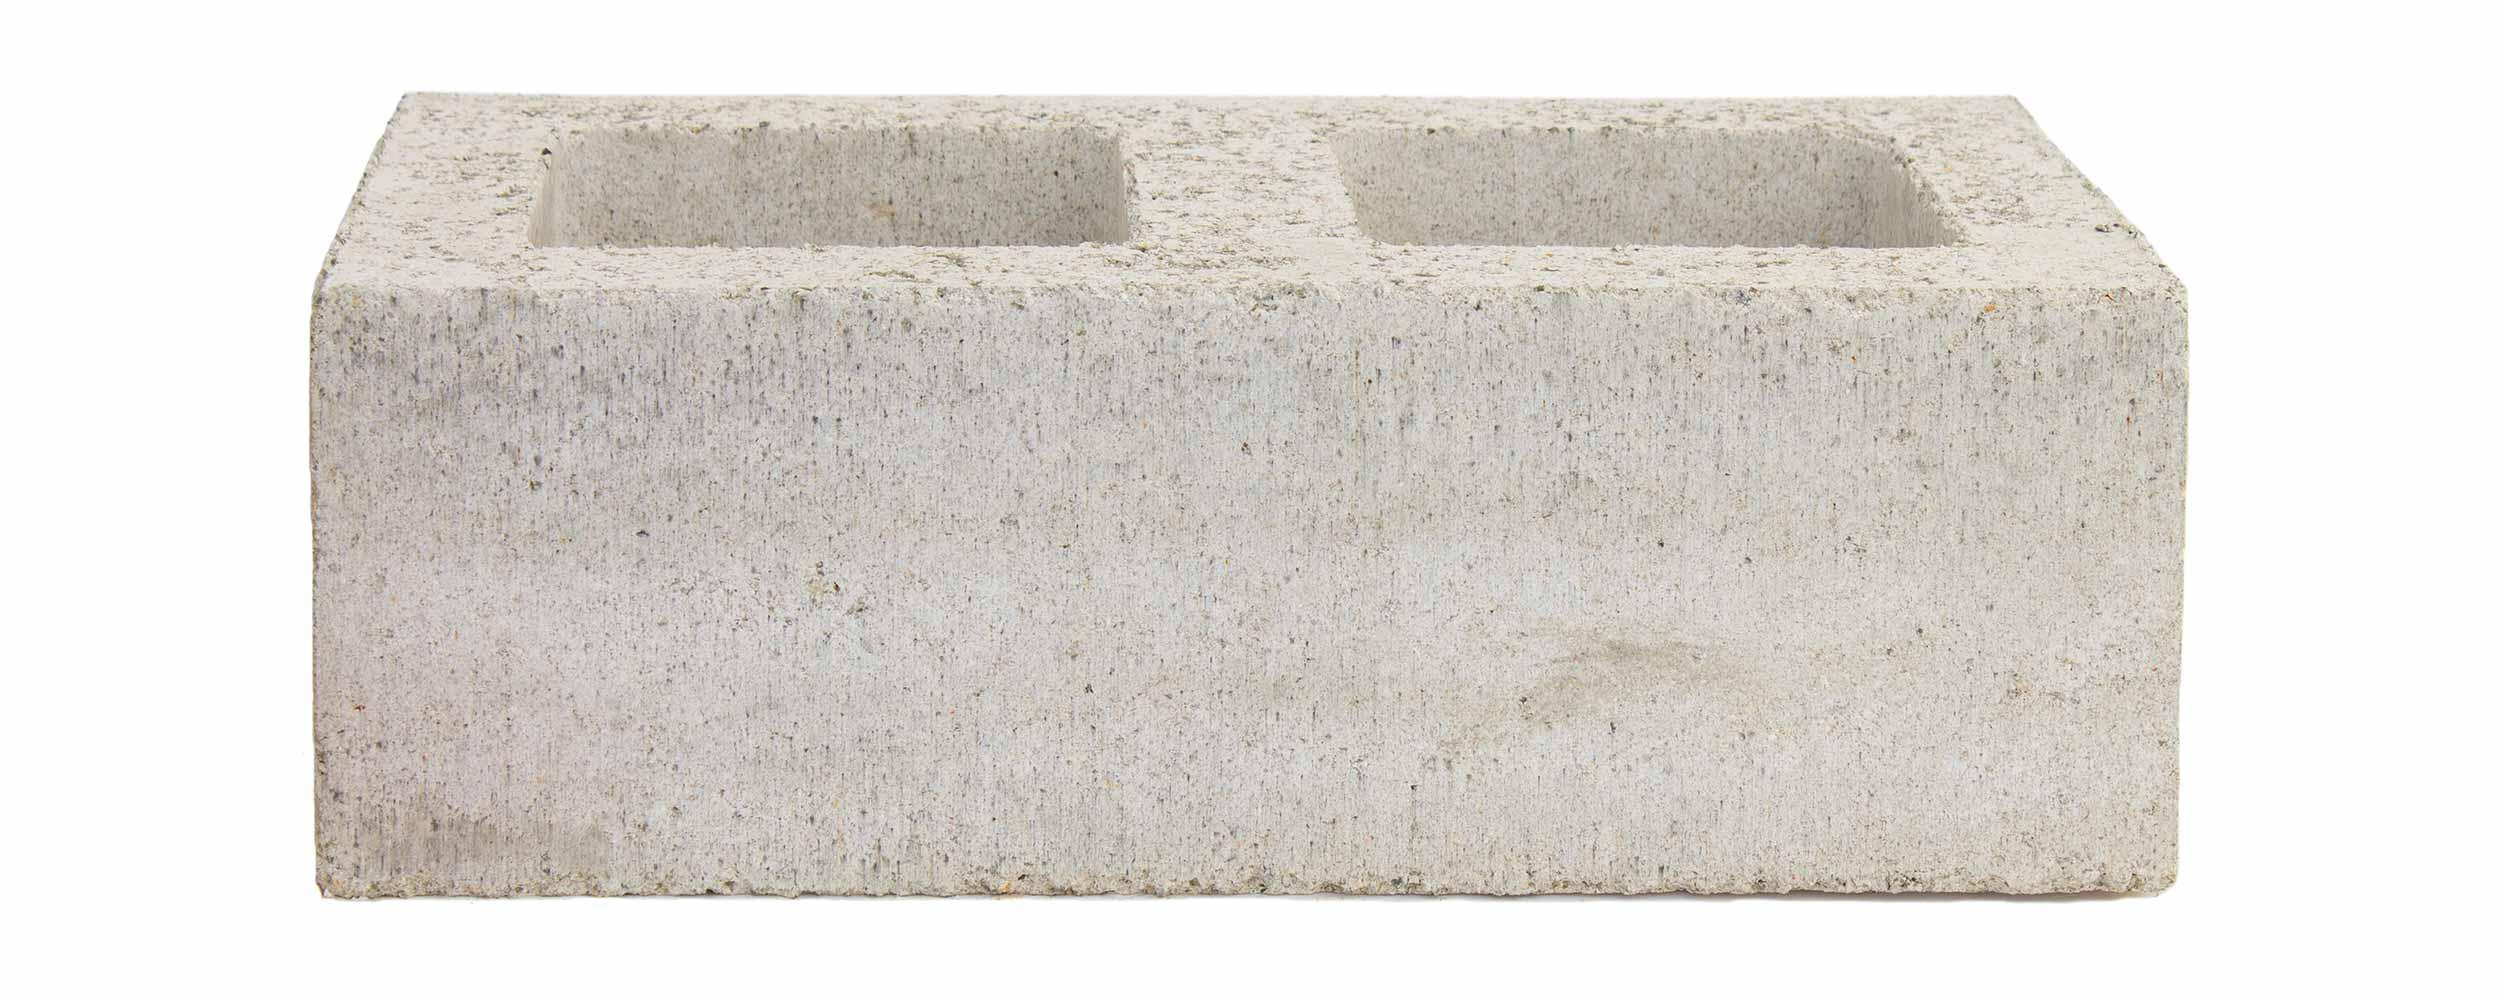 Watershed-Materials-White-Watershed-Block-3-2500.jpg